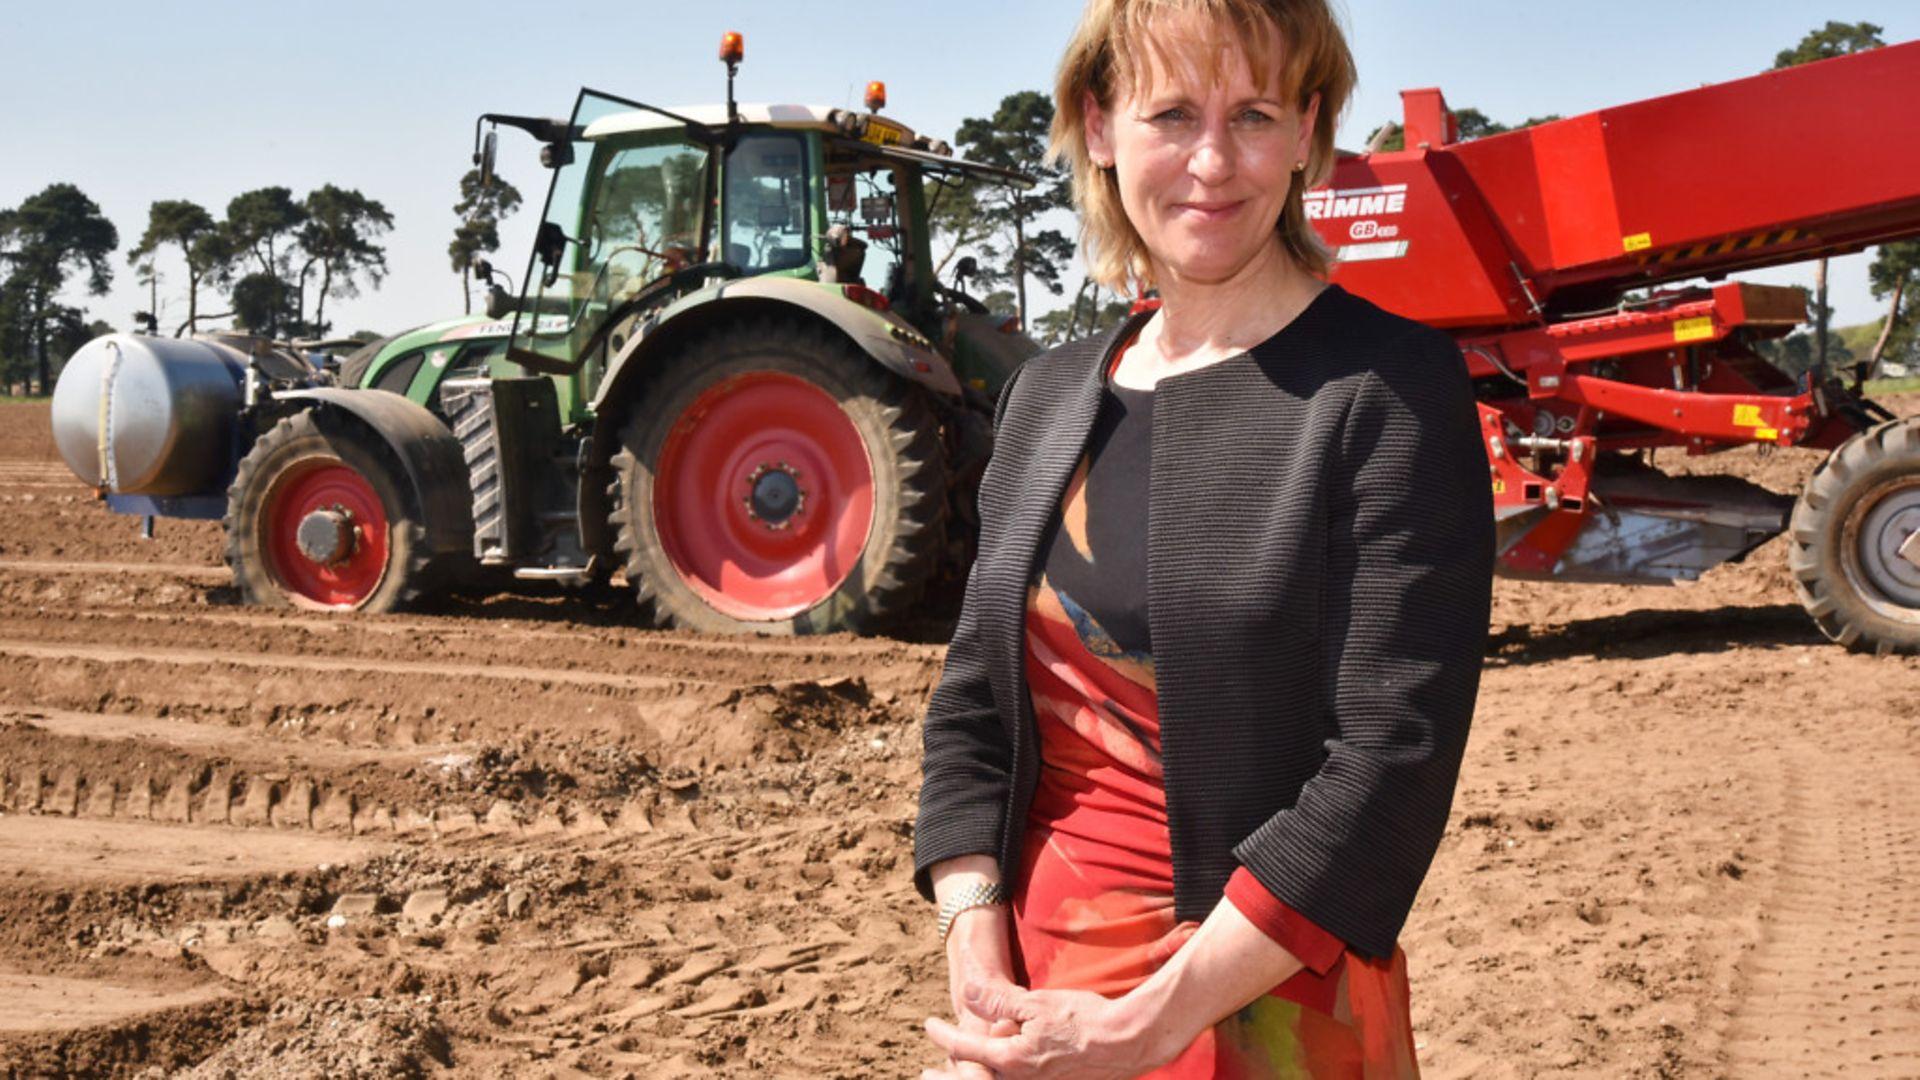 National Farmers Union president Minette Batters - Credit: Sonya Duncan